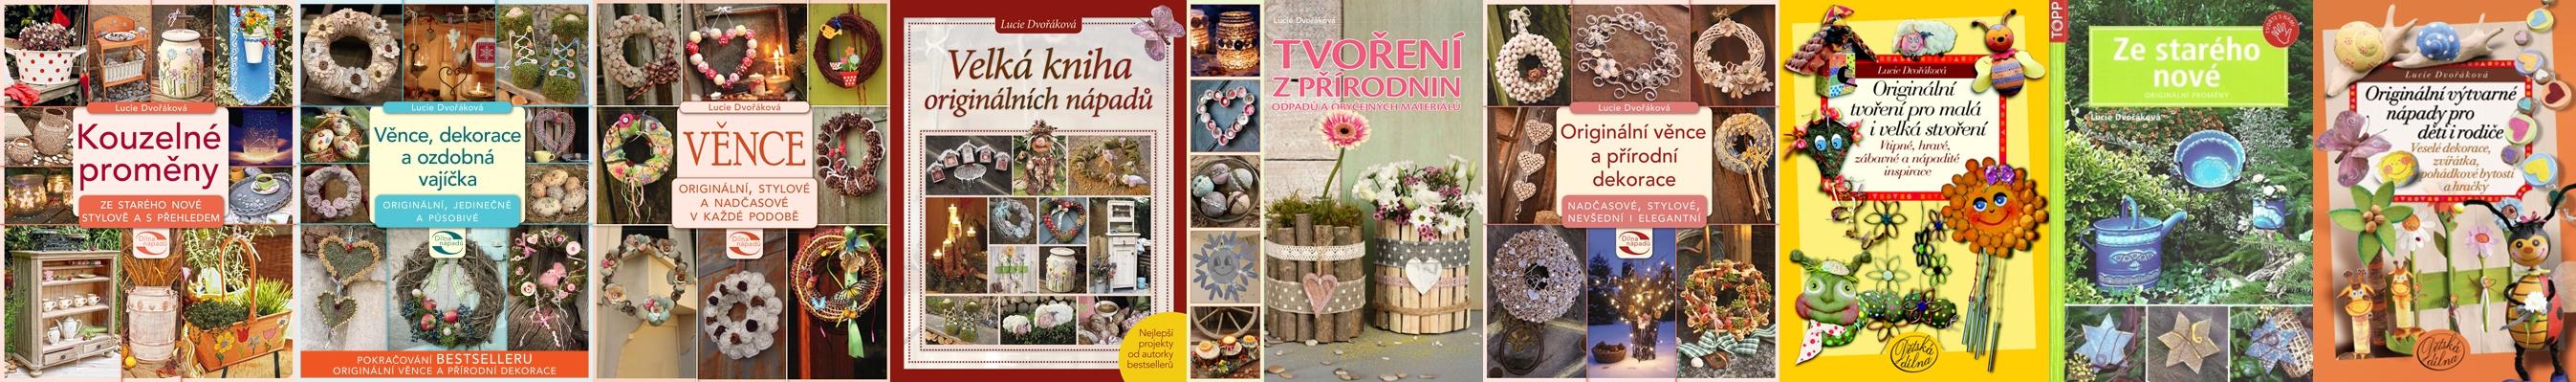 http://originalvyrobky.cz/objednavky-knih/